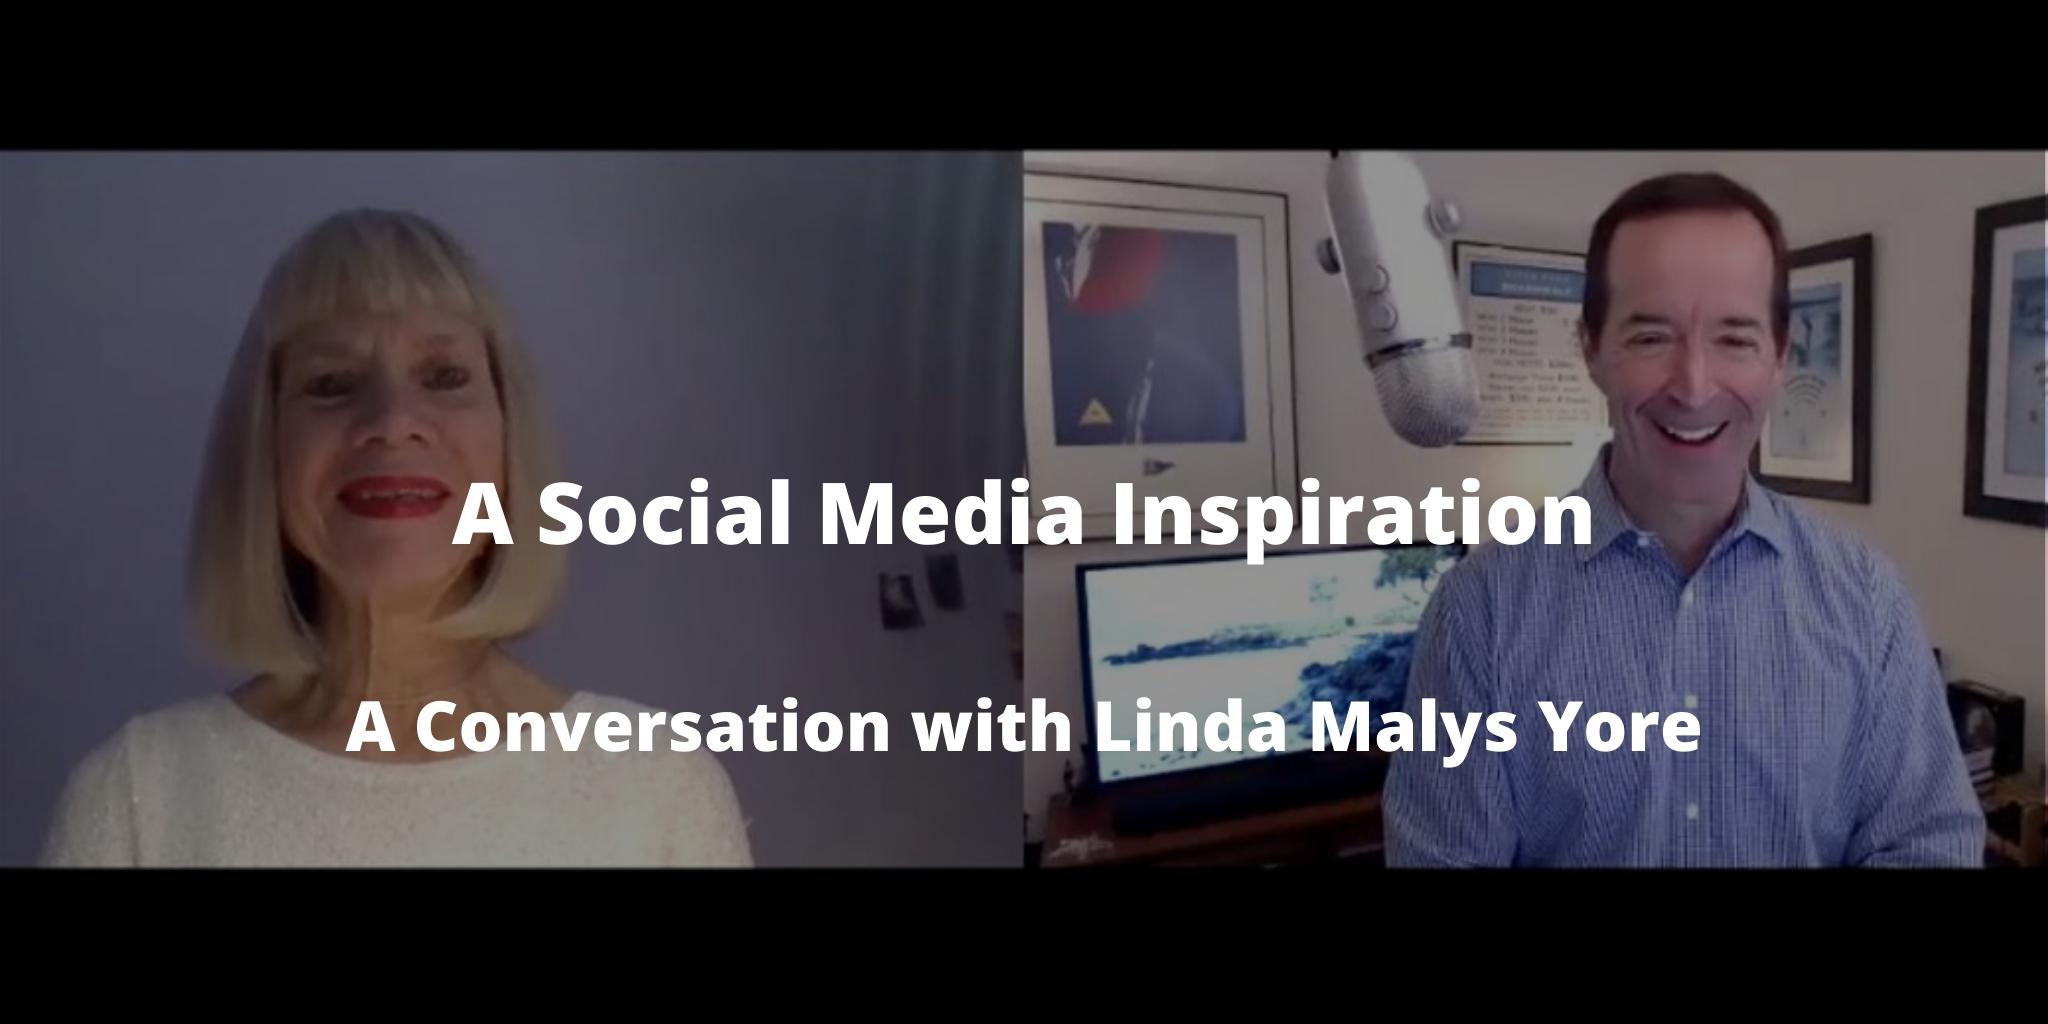 A Social Media Inspiration: A Conversation with Linda Malys Yore